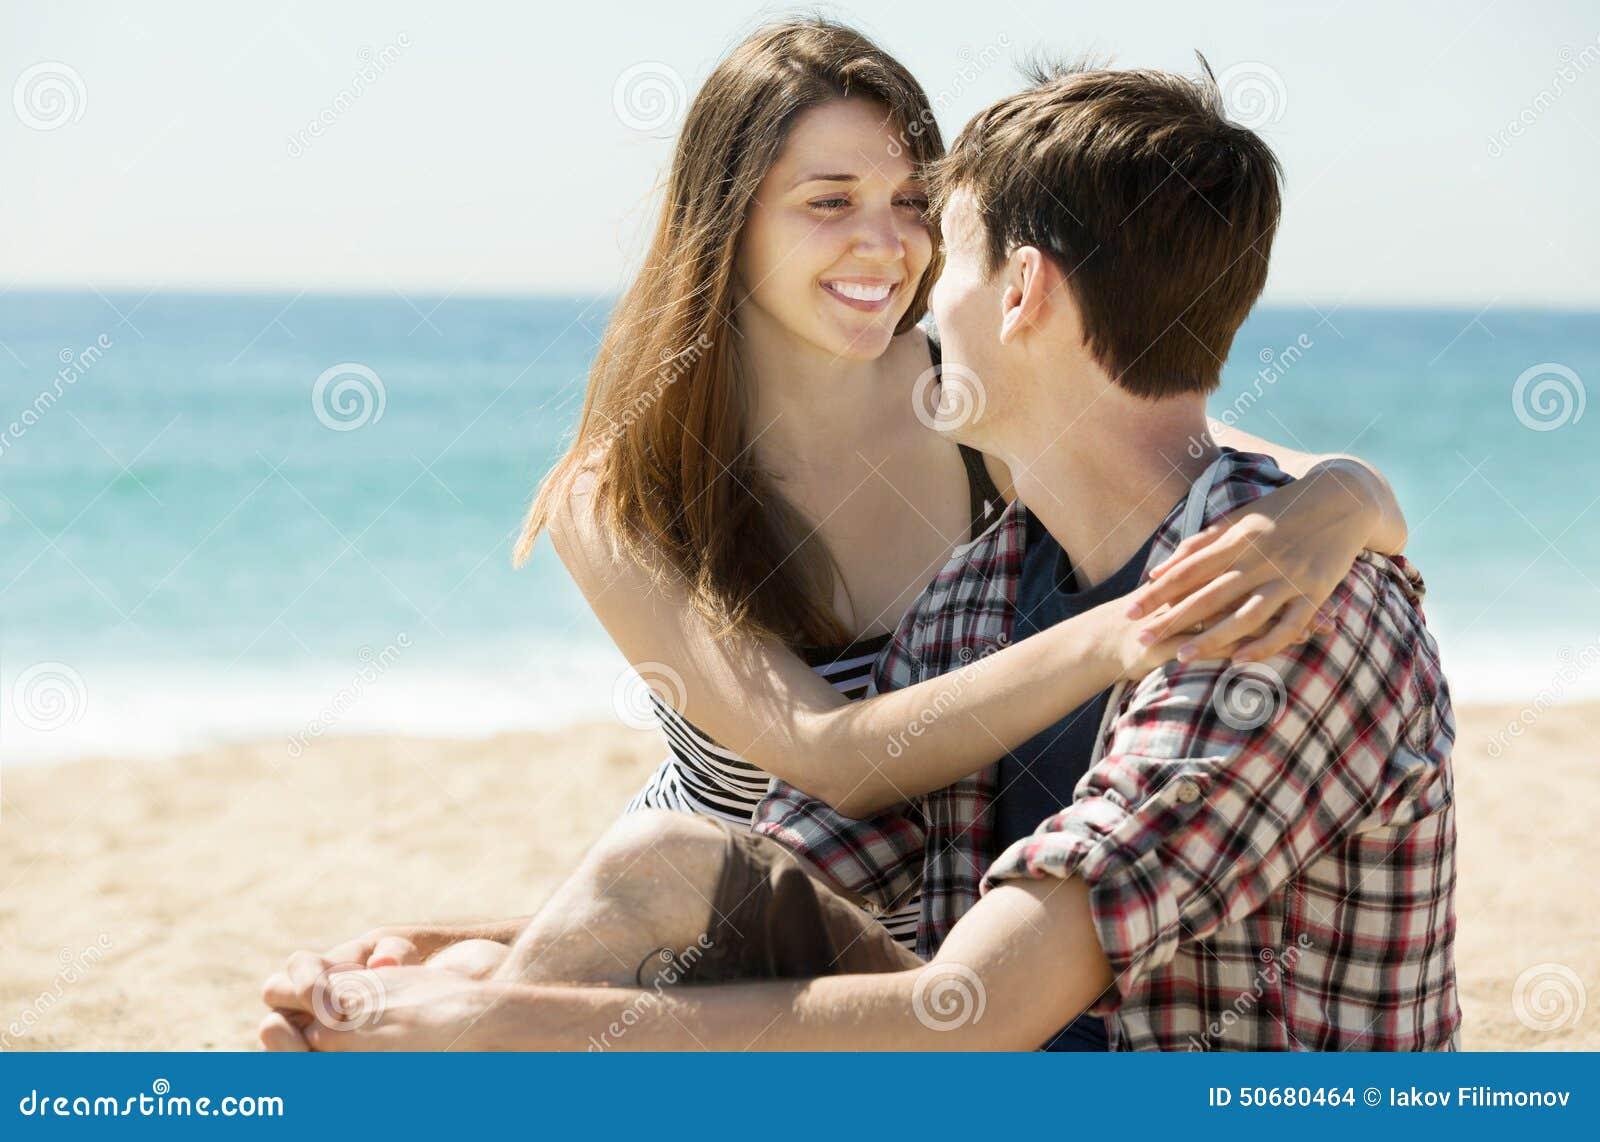 Download 在沙滩的微笑的夫妇 库存照片. 图片 包括有 偶然, 人们, 海运, 人员, 海岸线, 乐趣, 海洋, 自由 - 50680464